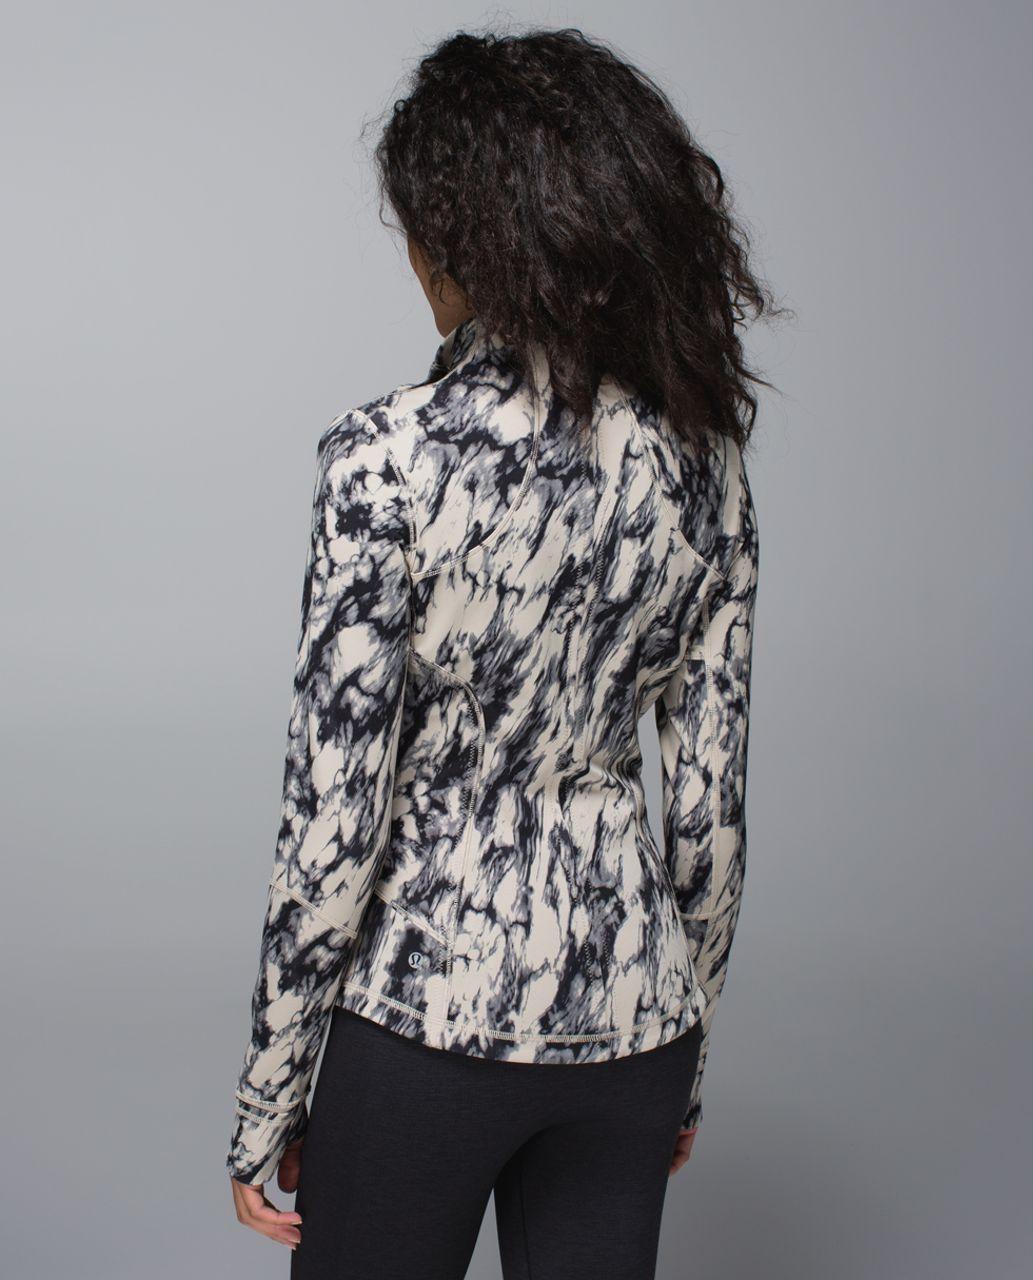 Lululemon Forme Jacket *Cuffins - Great Granite Black Mojave Tan